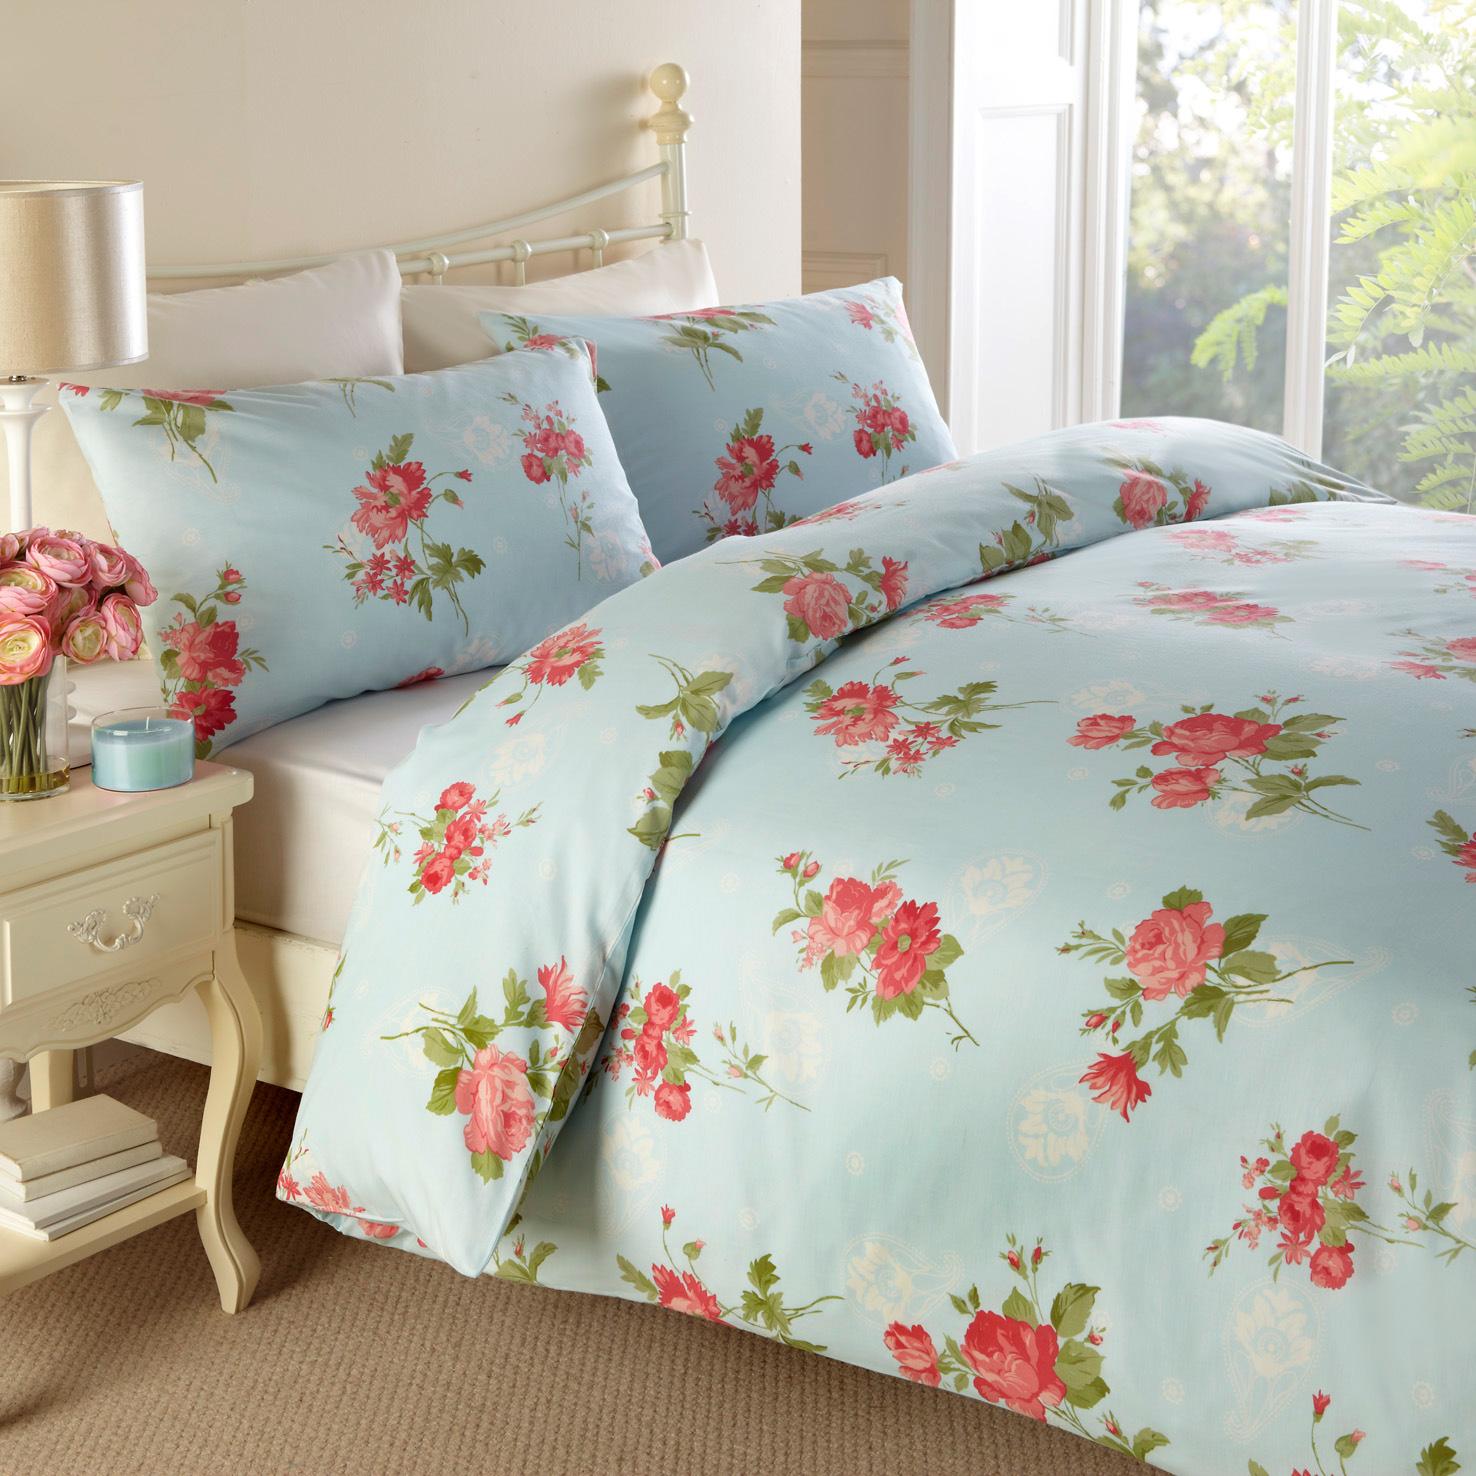 Traditional Floral Printed Bedding Vintage Duvet Cover